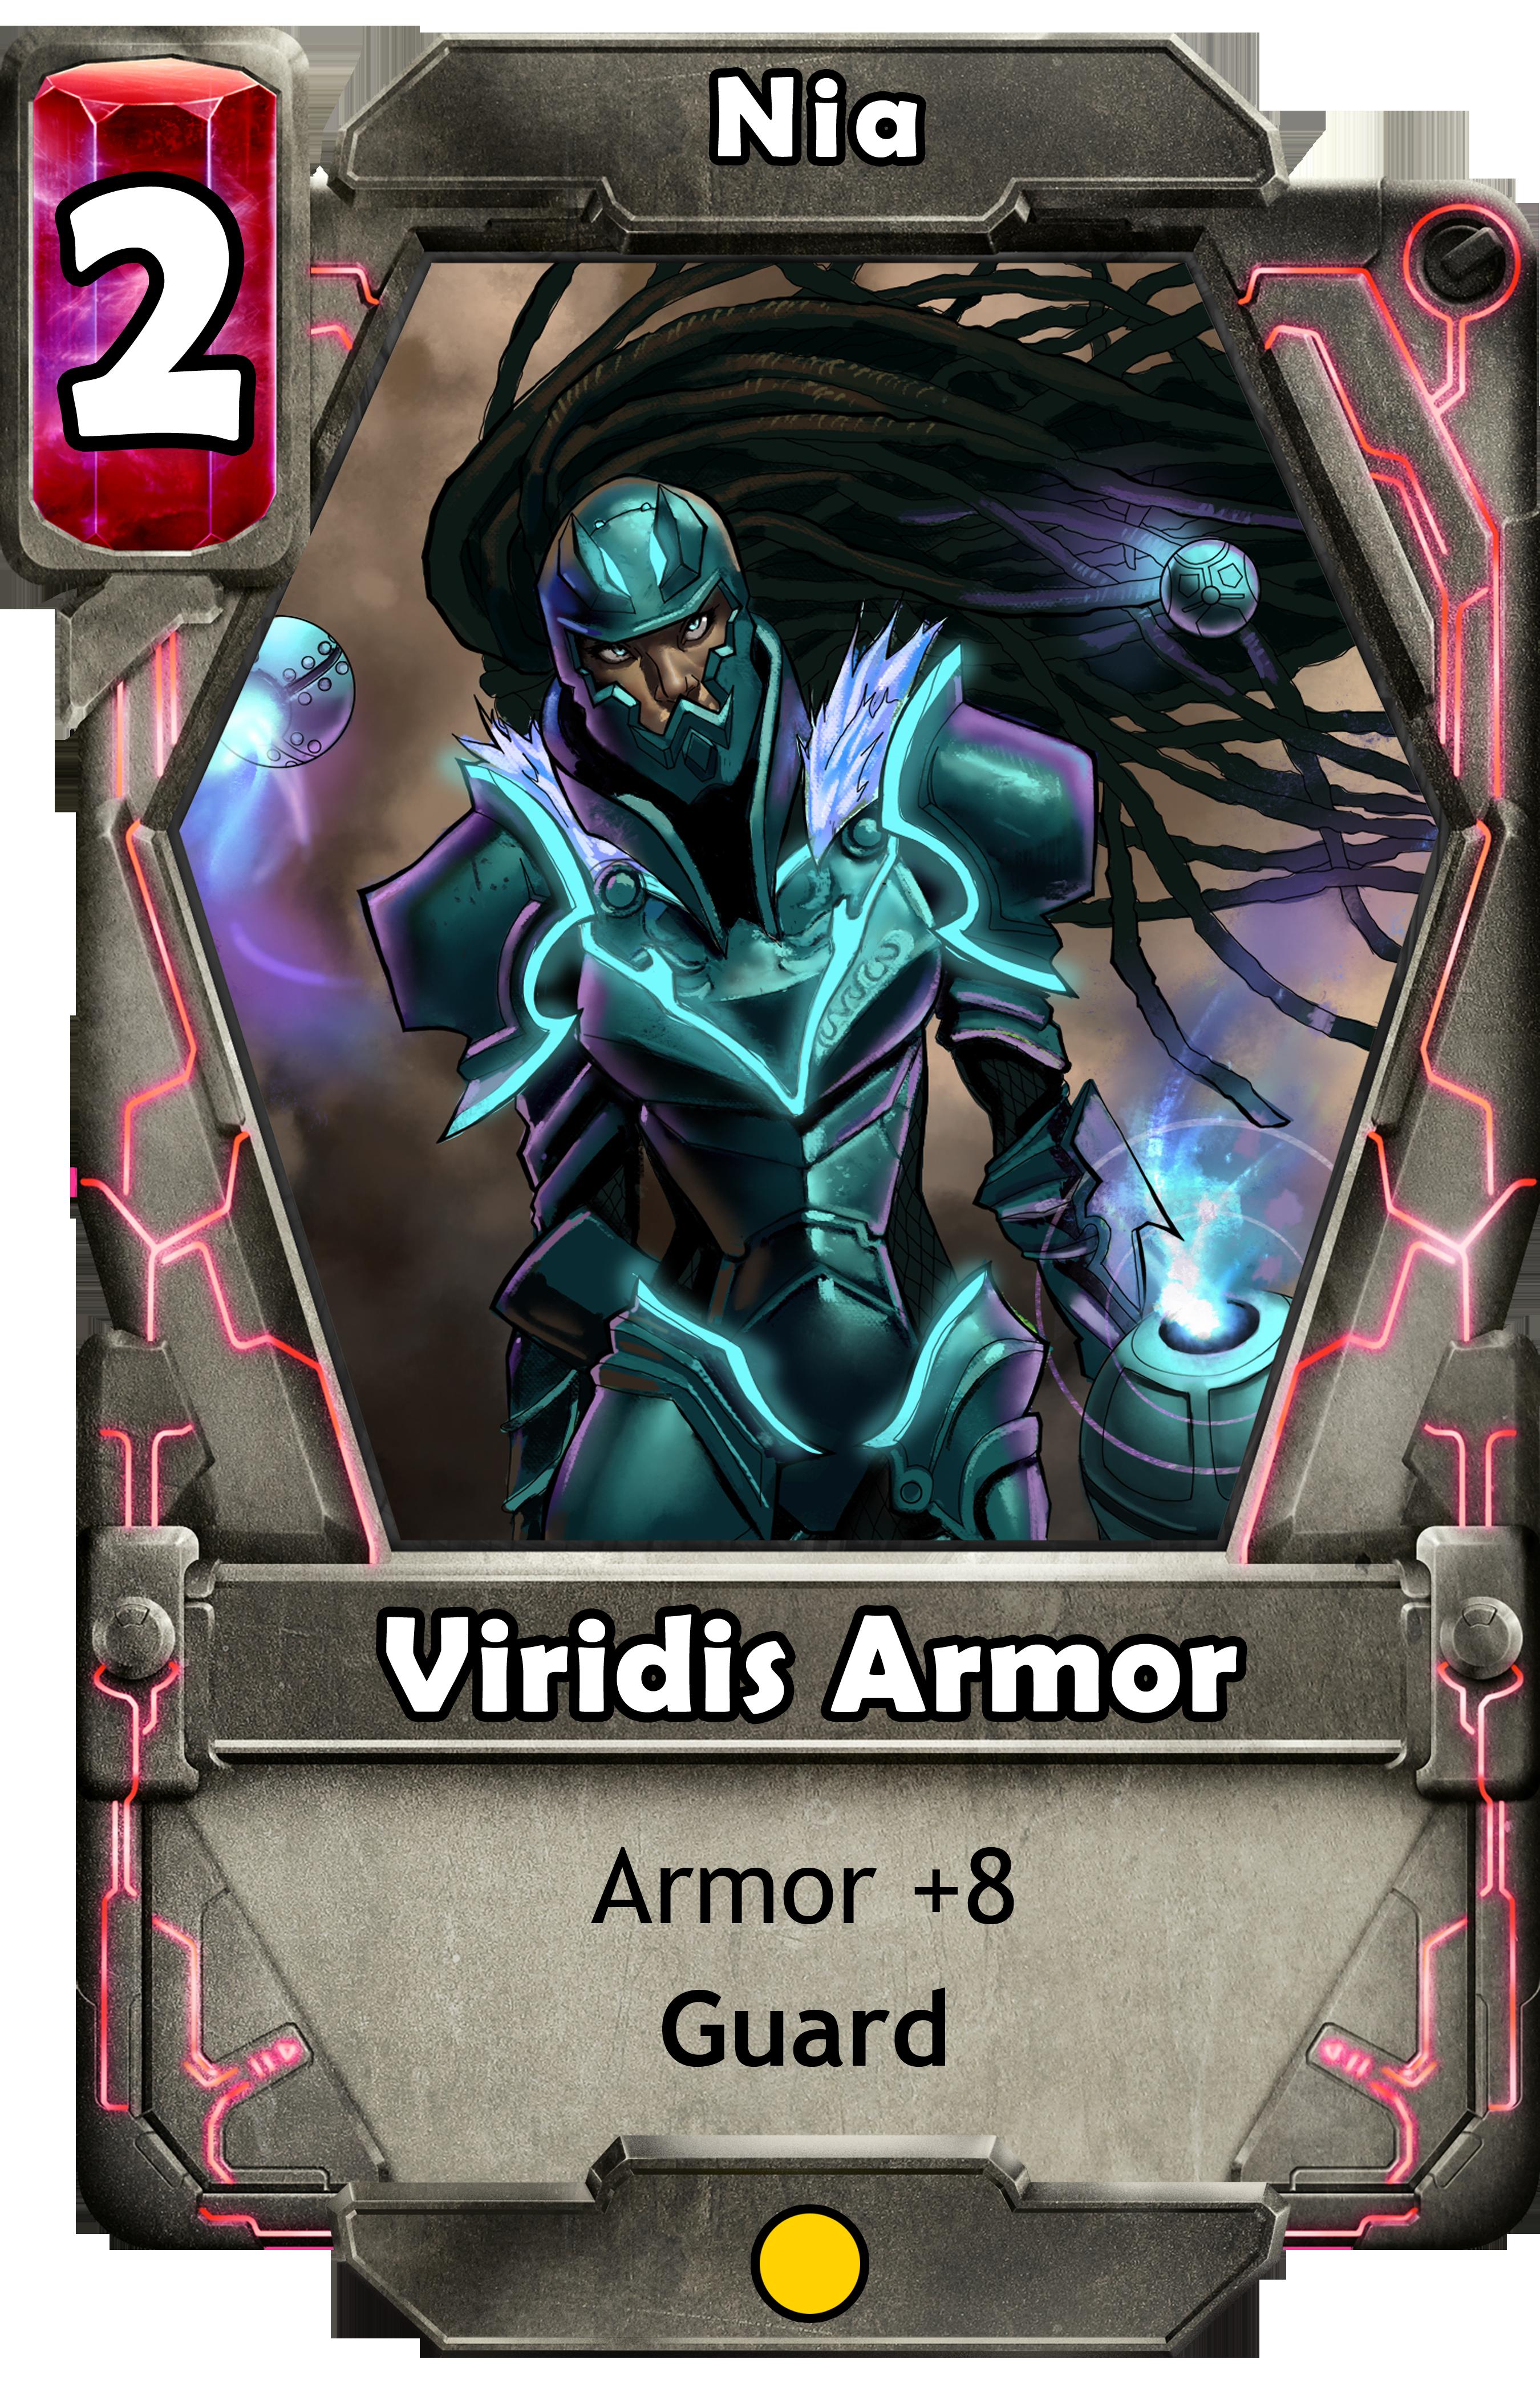 Viridis Armor